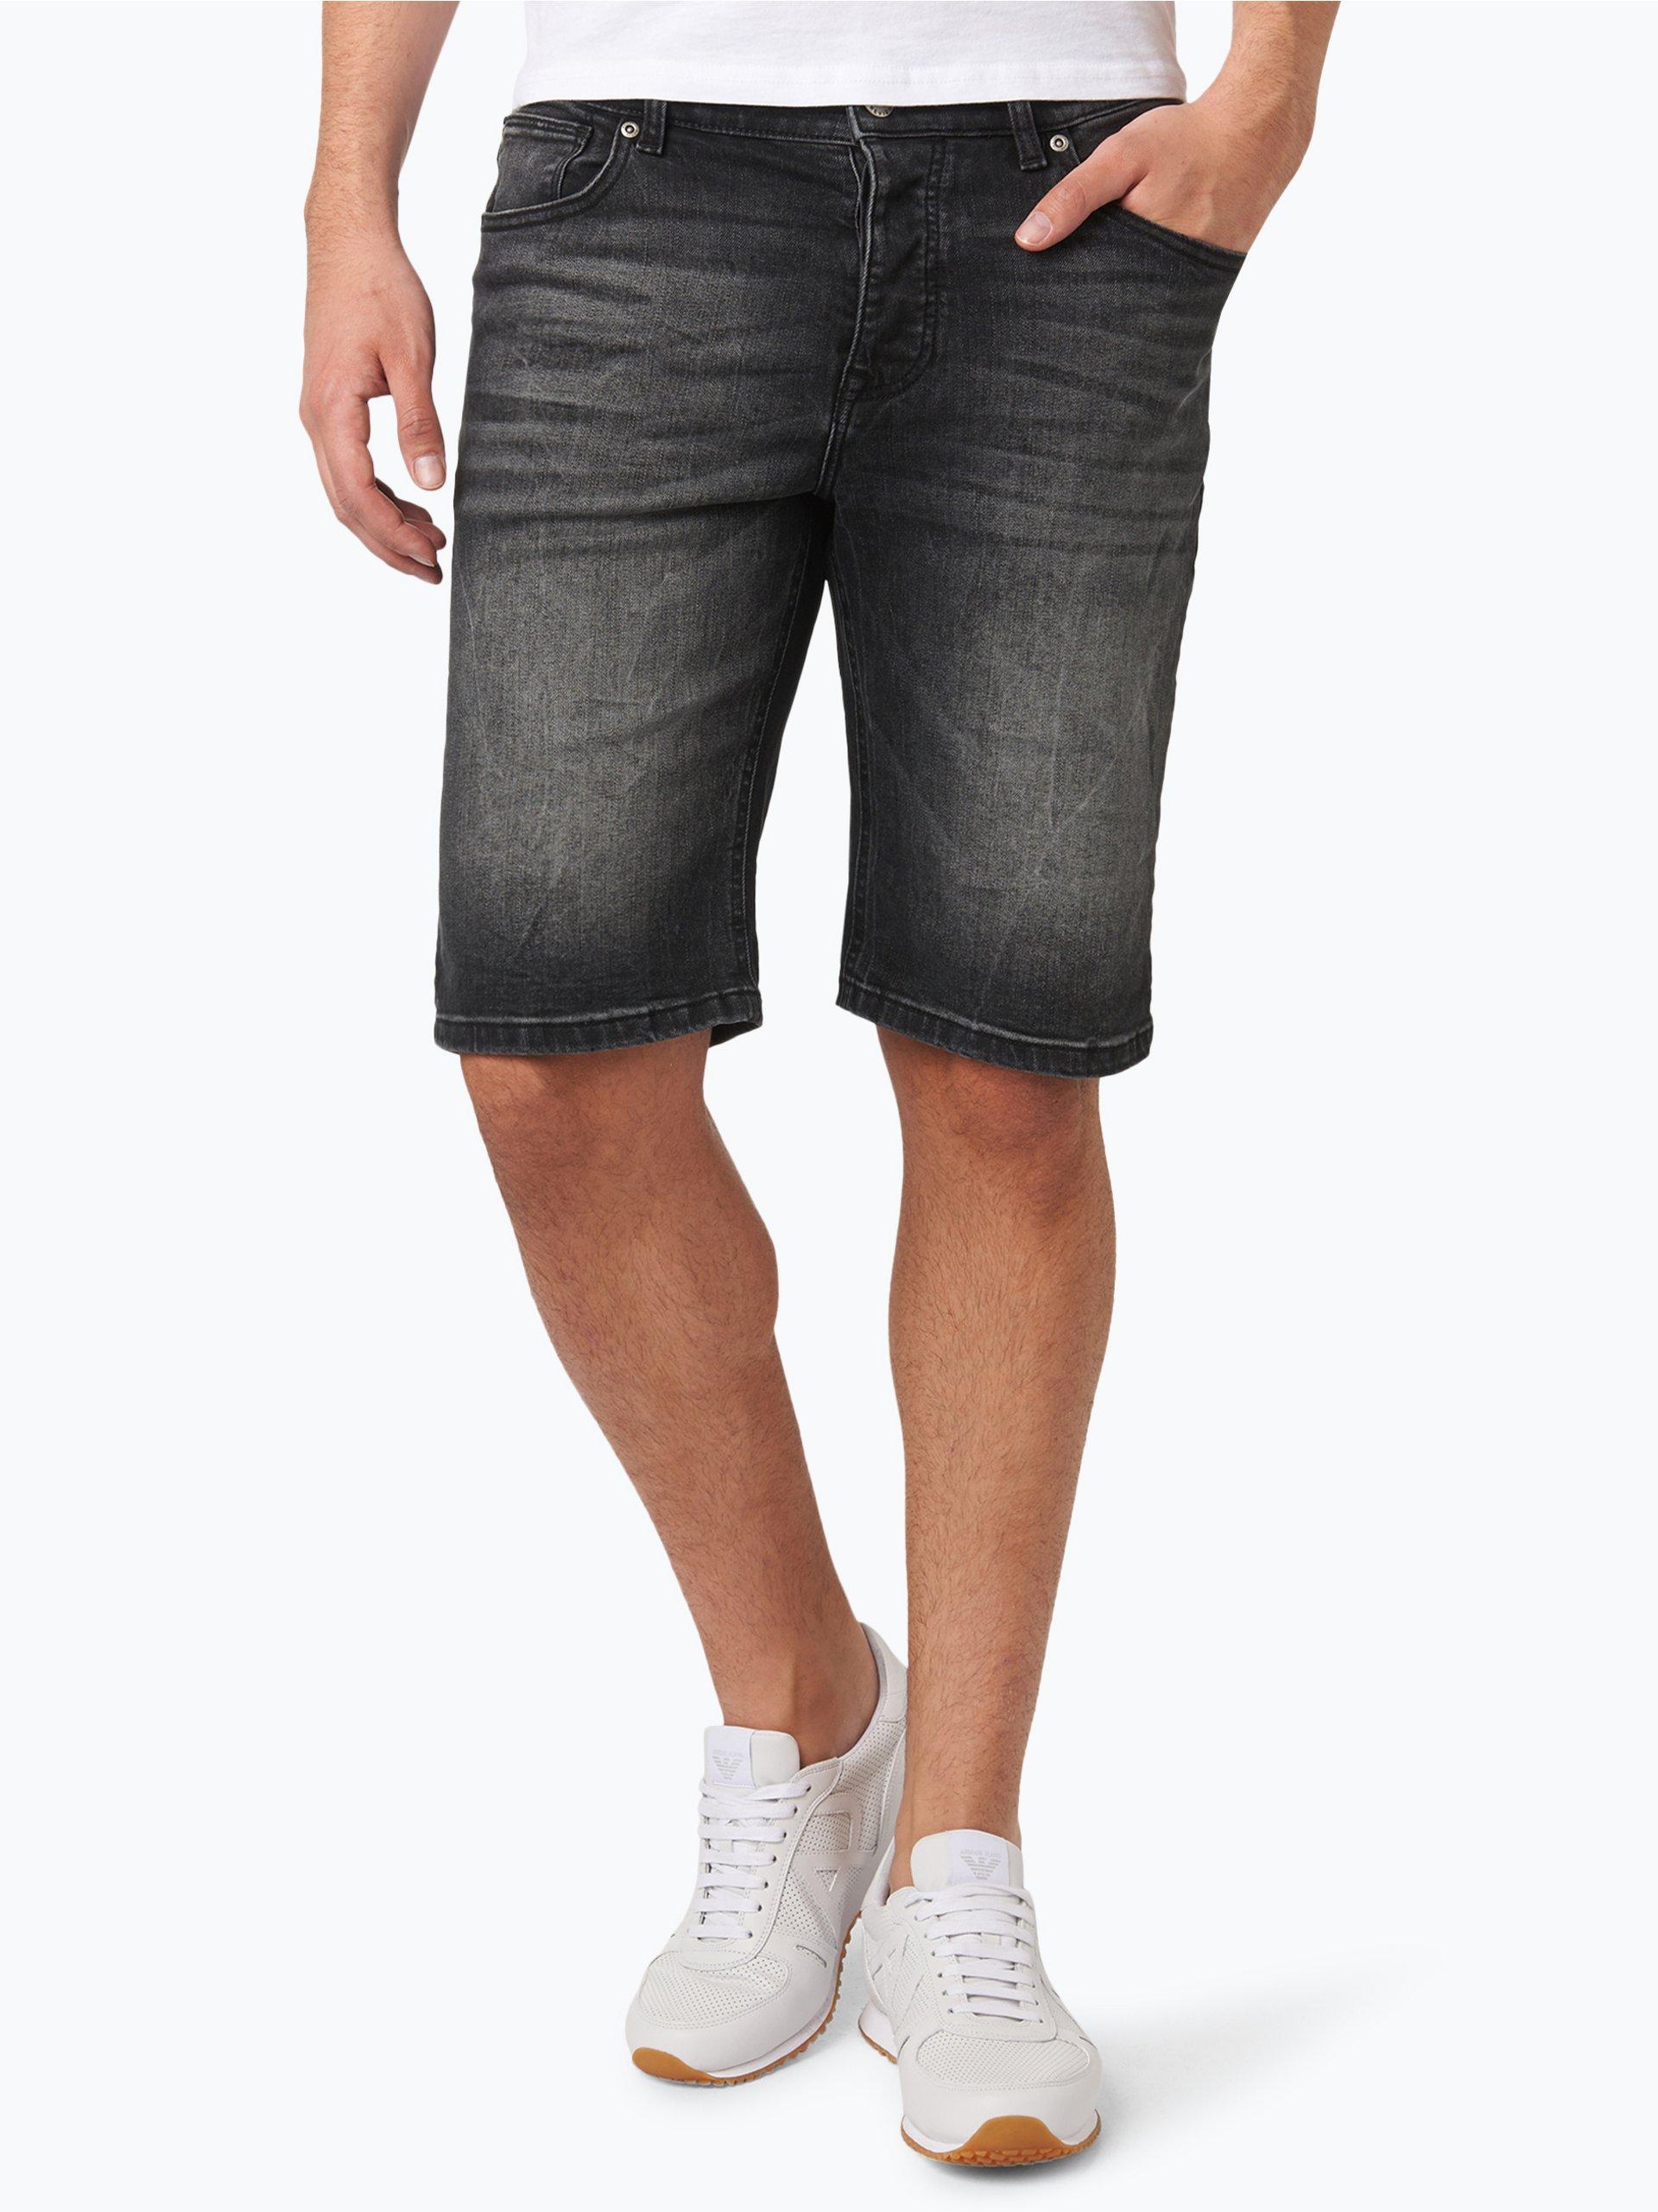 review herren jeans bermuda 2 online kaufen peek und cloppenburg de. Black Bedroom Furniture Sets. Home Design Ideas